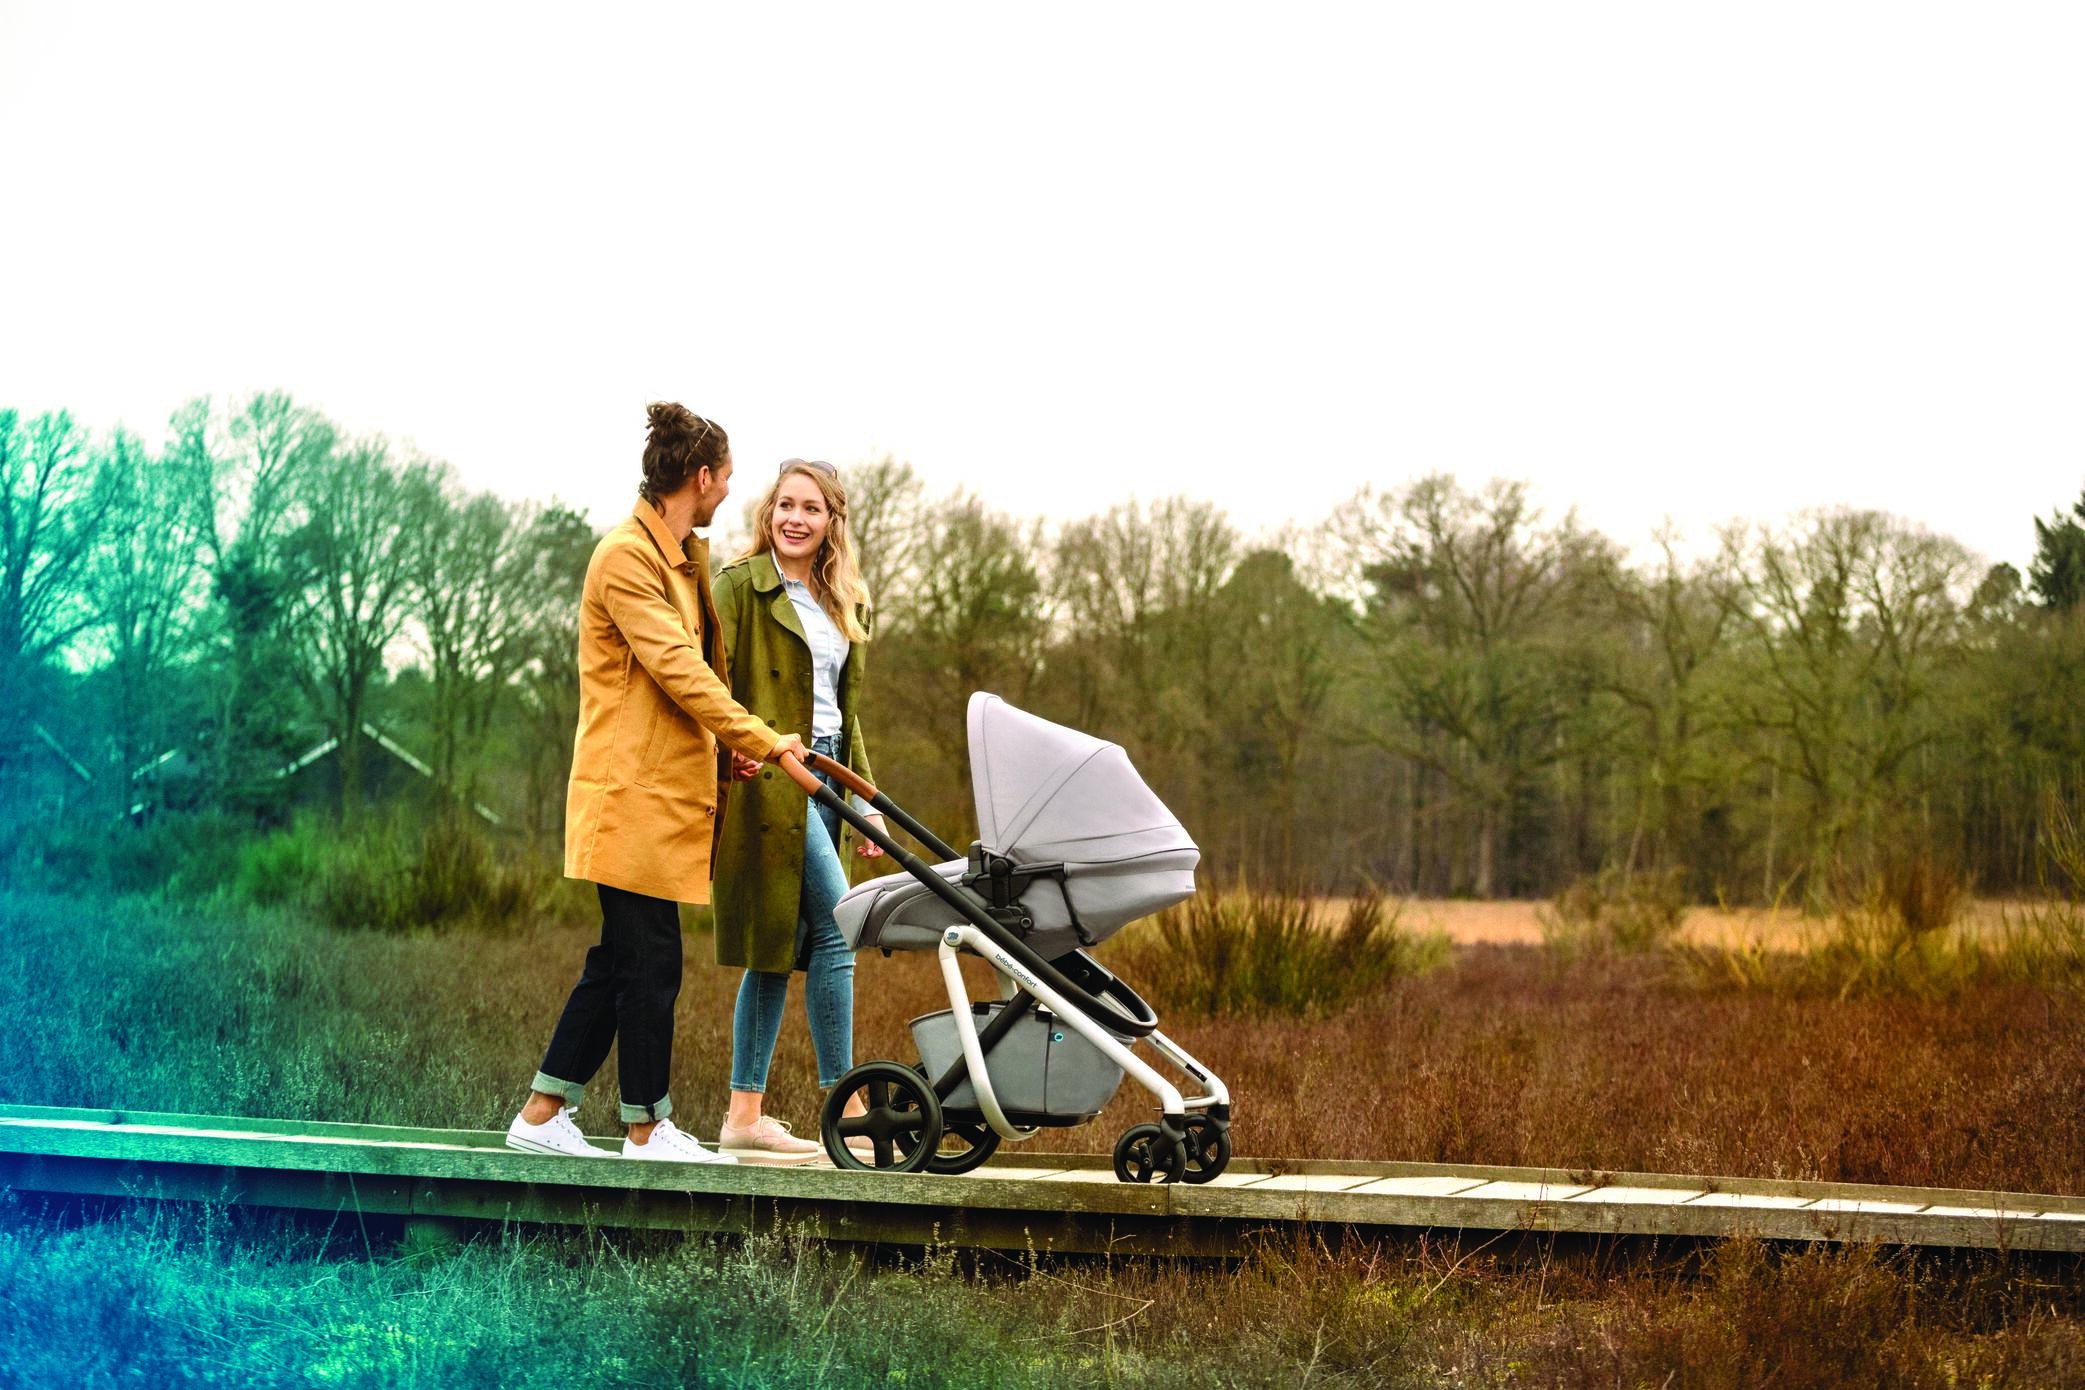 BBC1311_2018_bebeconfort_stroller_Lila_Lifestyle_Autumn_momdadstrollingbassinet_Landscape